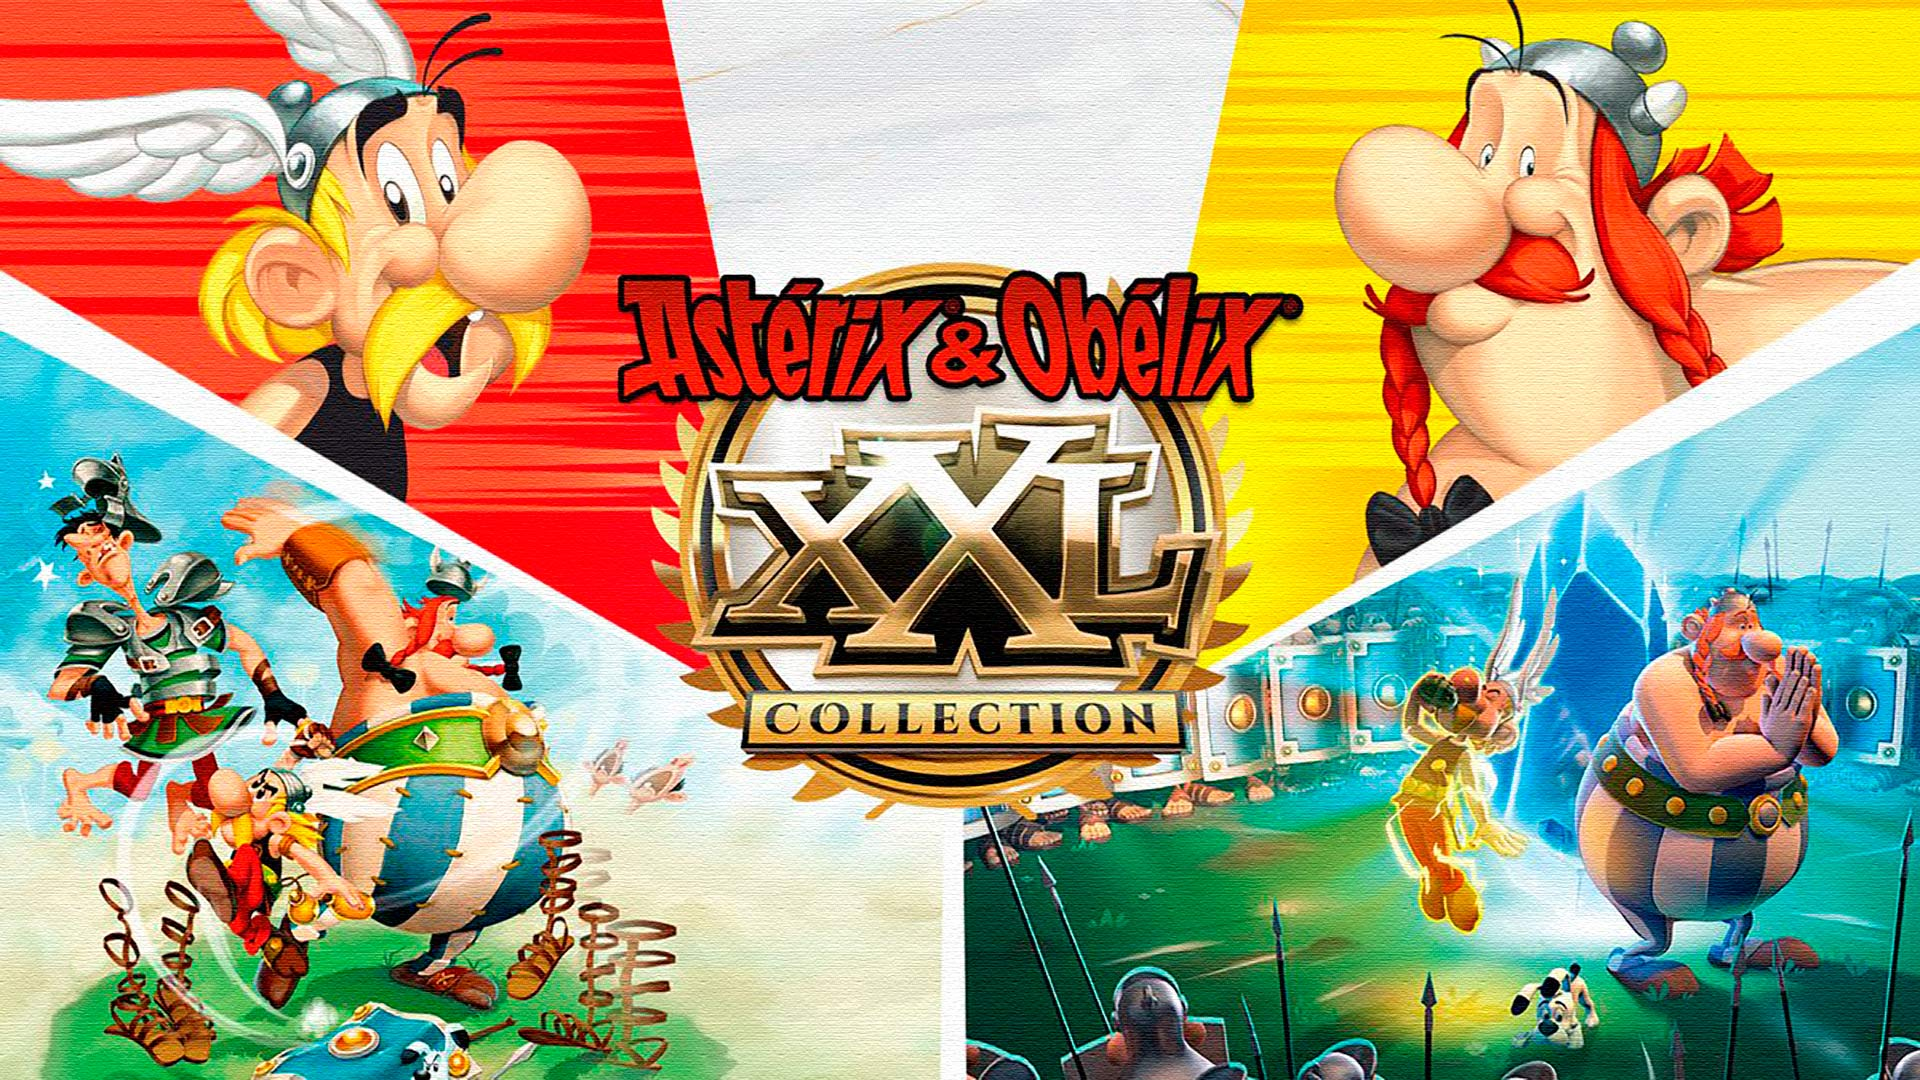 Asterix y Obelix XXL: Collection